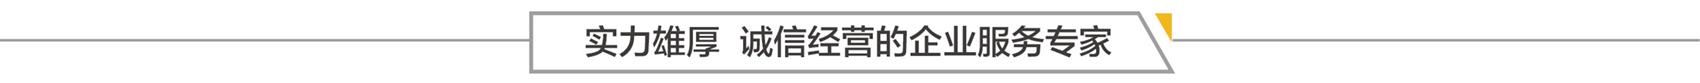 产品页demo_10.jpg